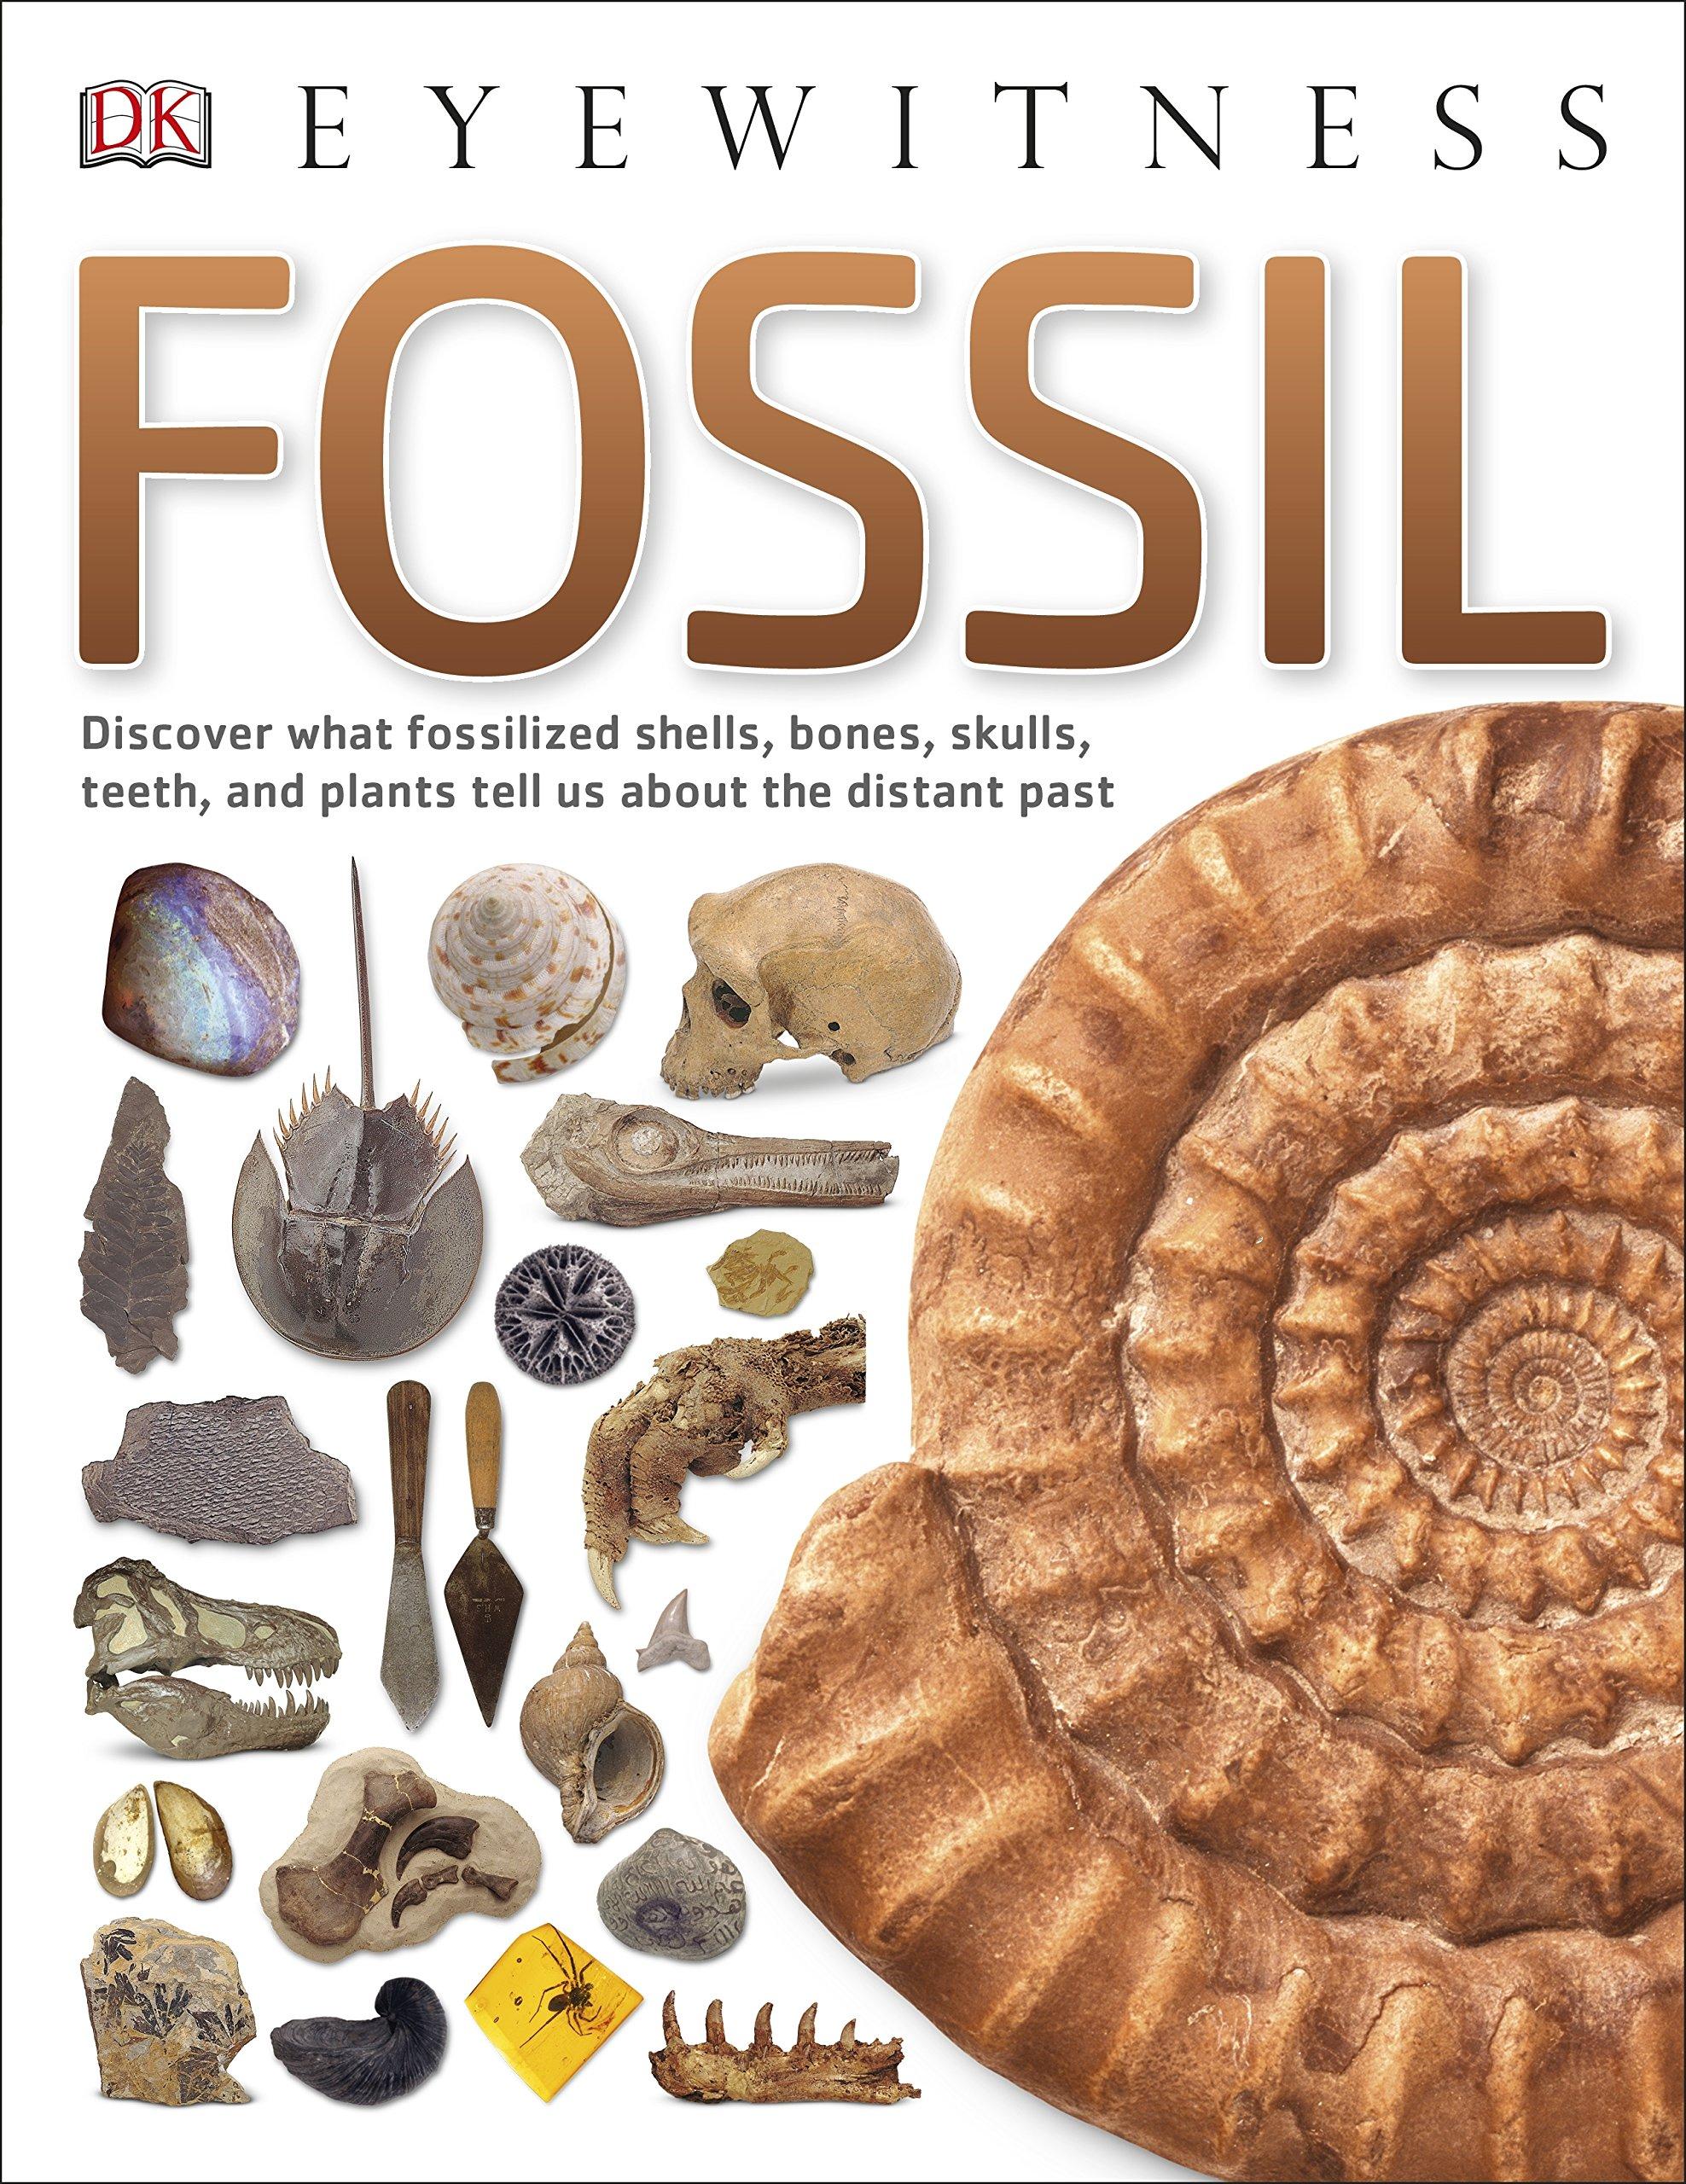 Fossil DK Eyewitness Books